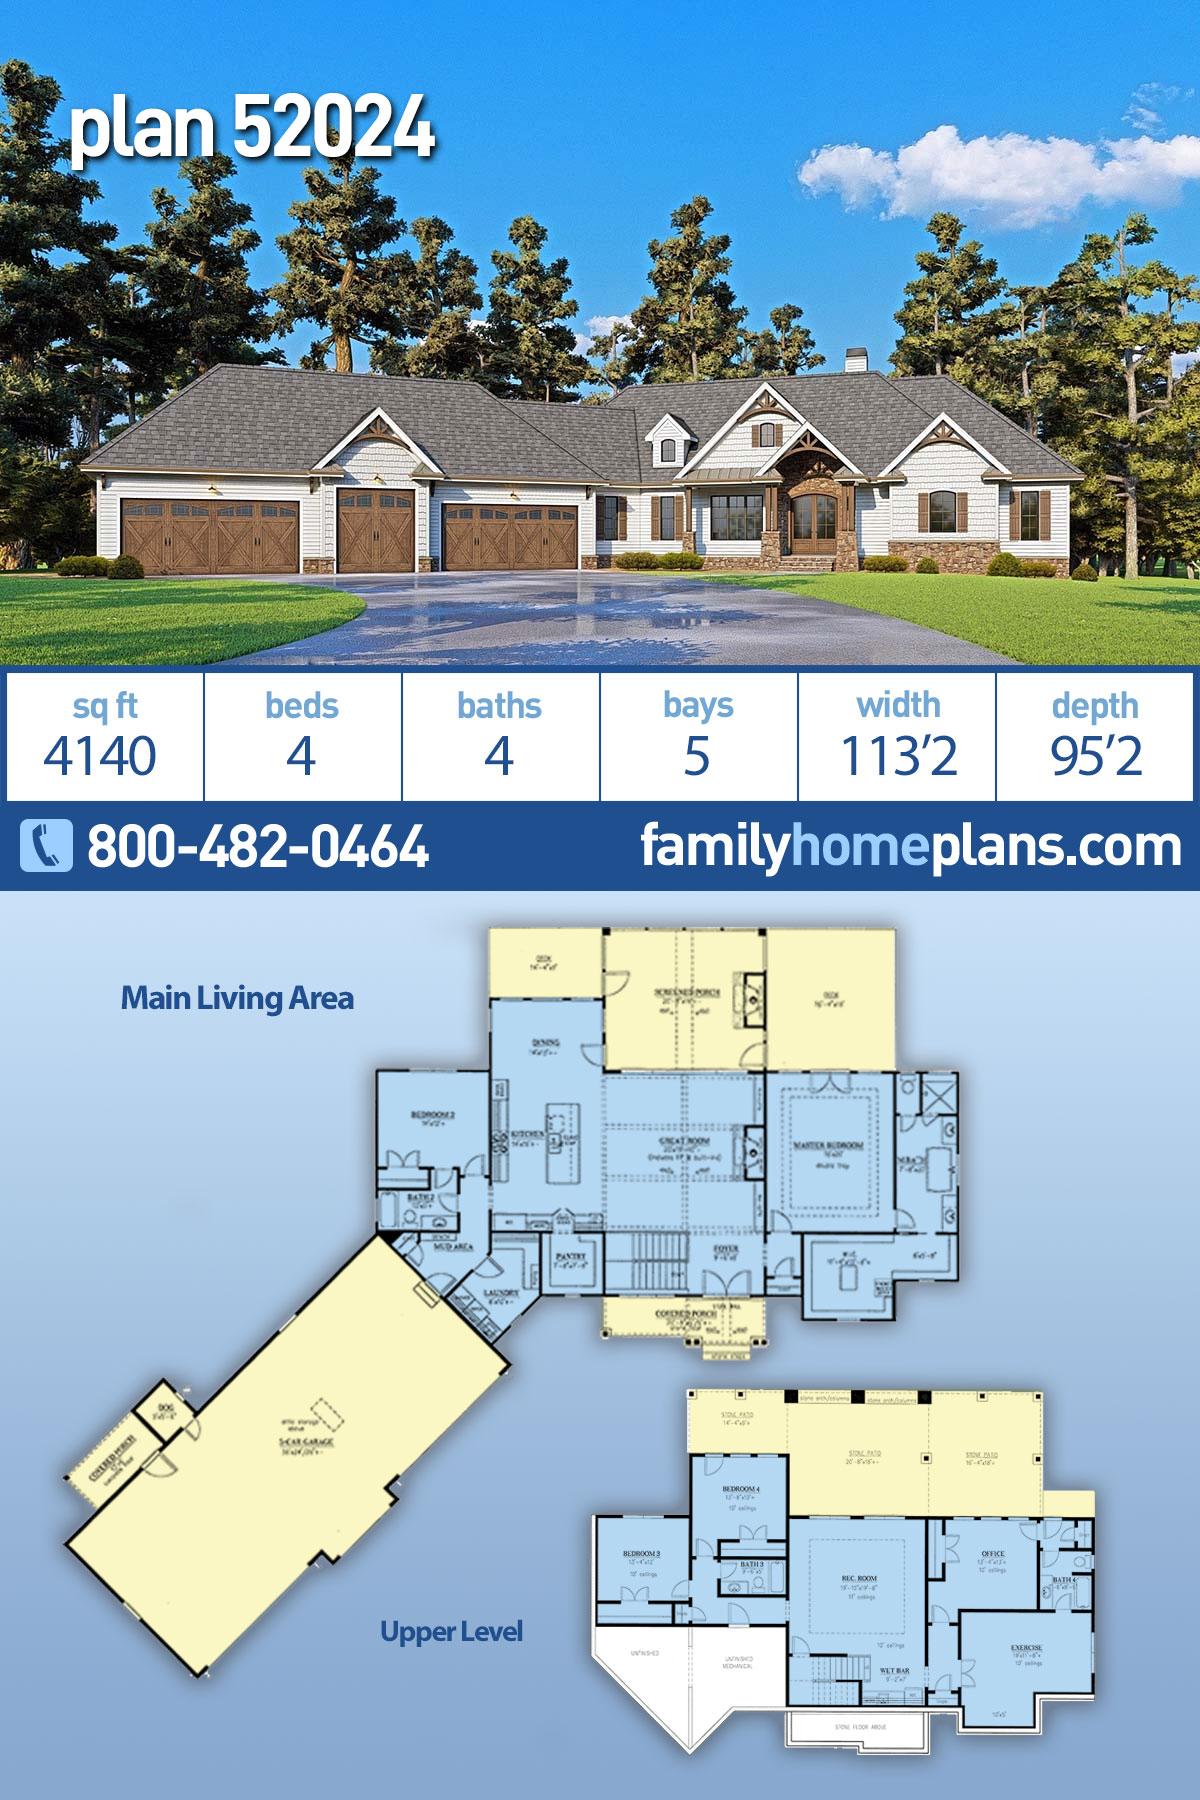 Craftsman, Farmhouse, Southern House Plan 52024 with 4 Beds, 4 Baths, 5 Car Garage